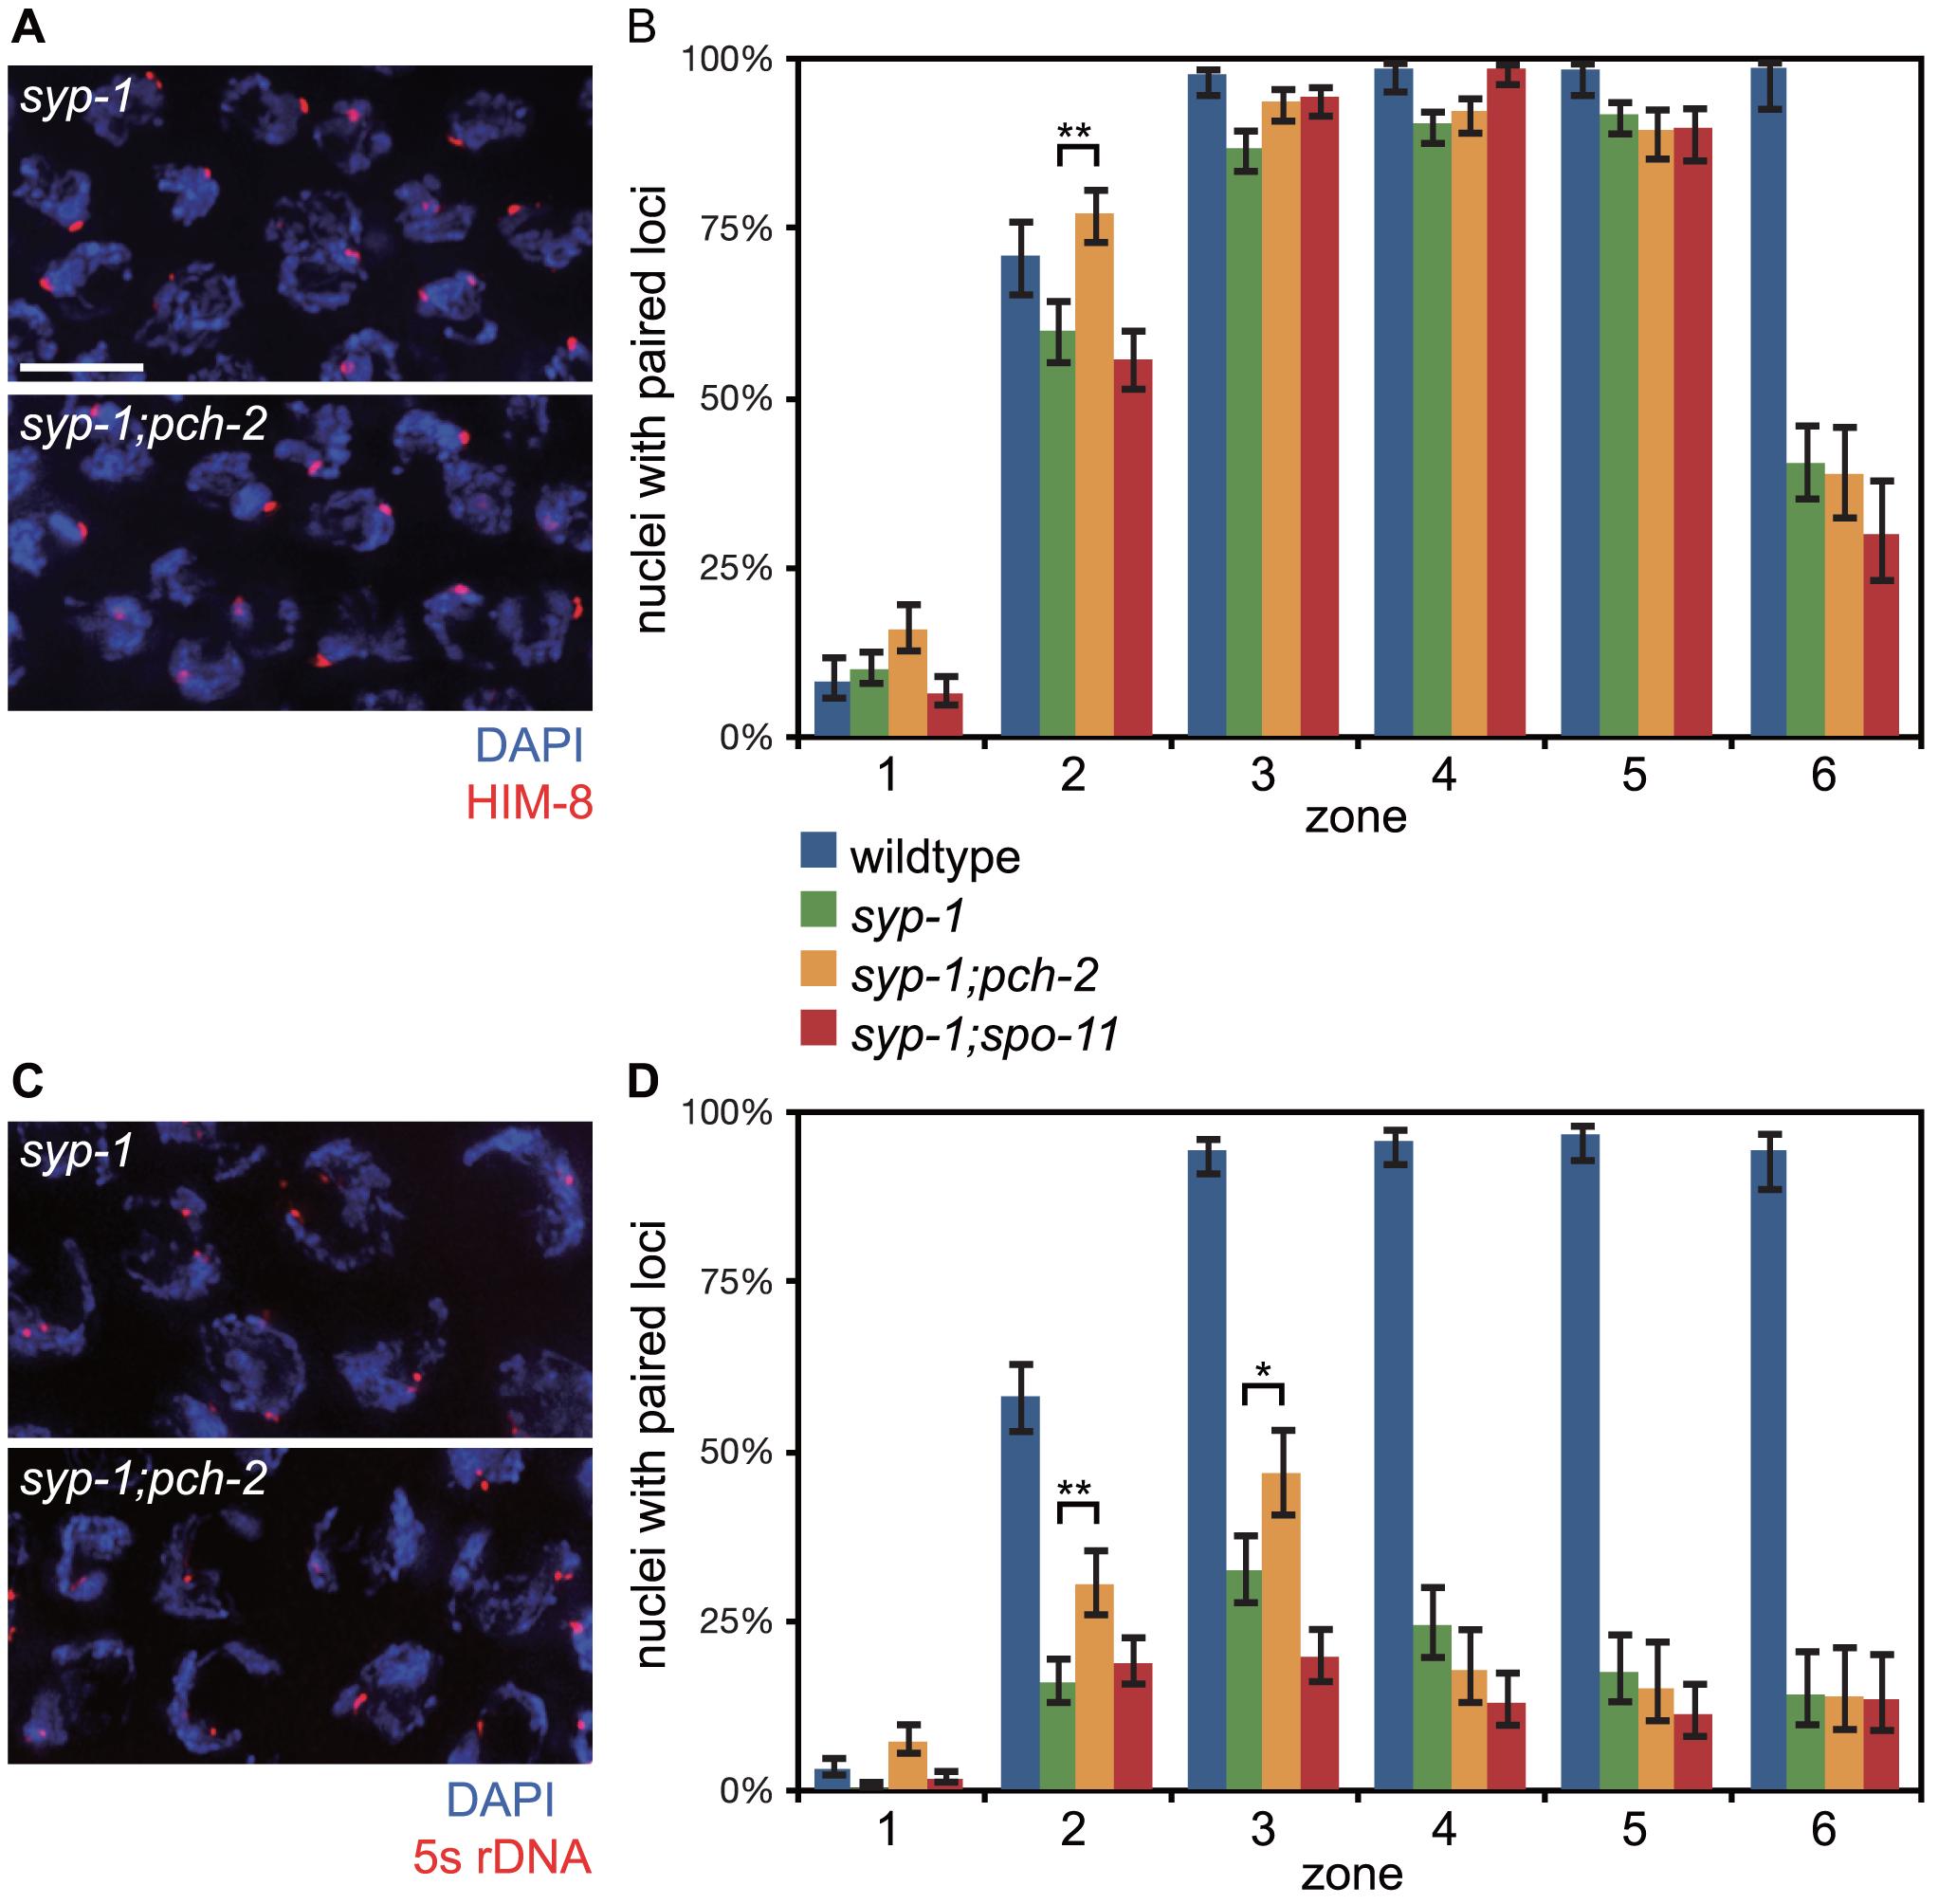 Mutation of <i>pch-2</i> suppresses pairing defects in <i>syp-1</i> mutants.